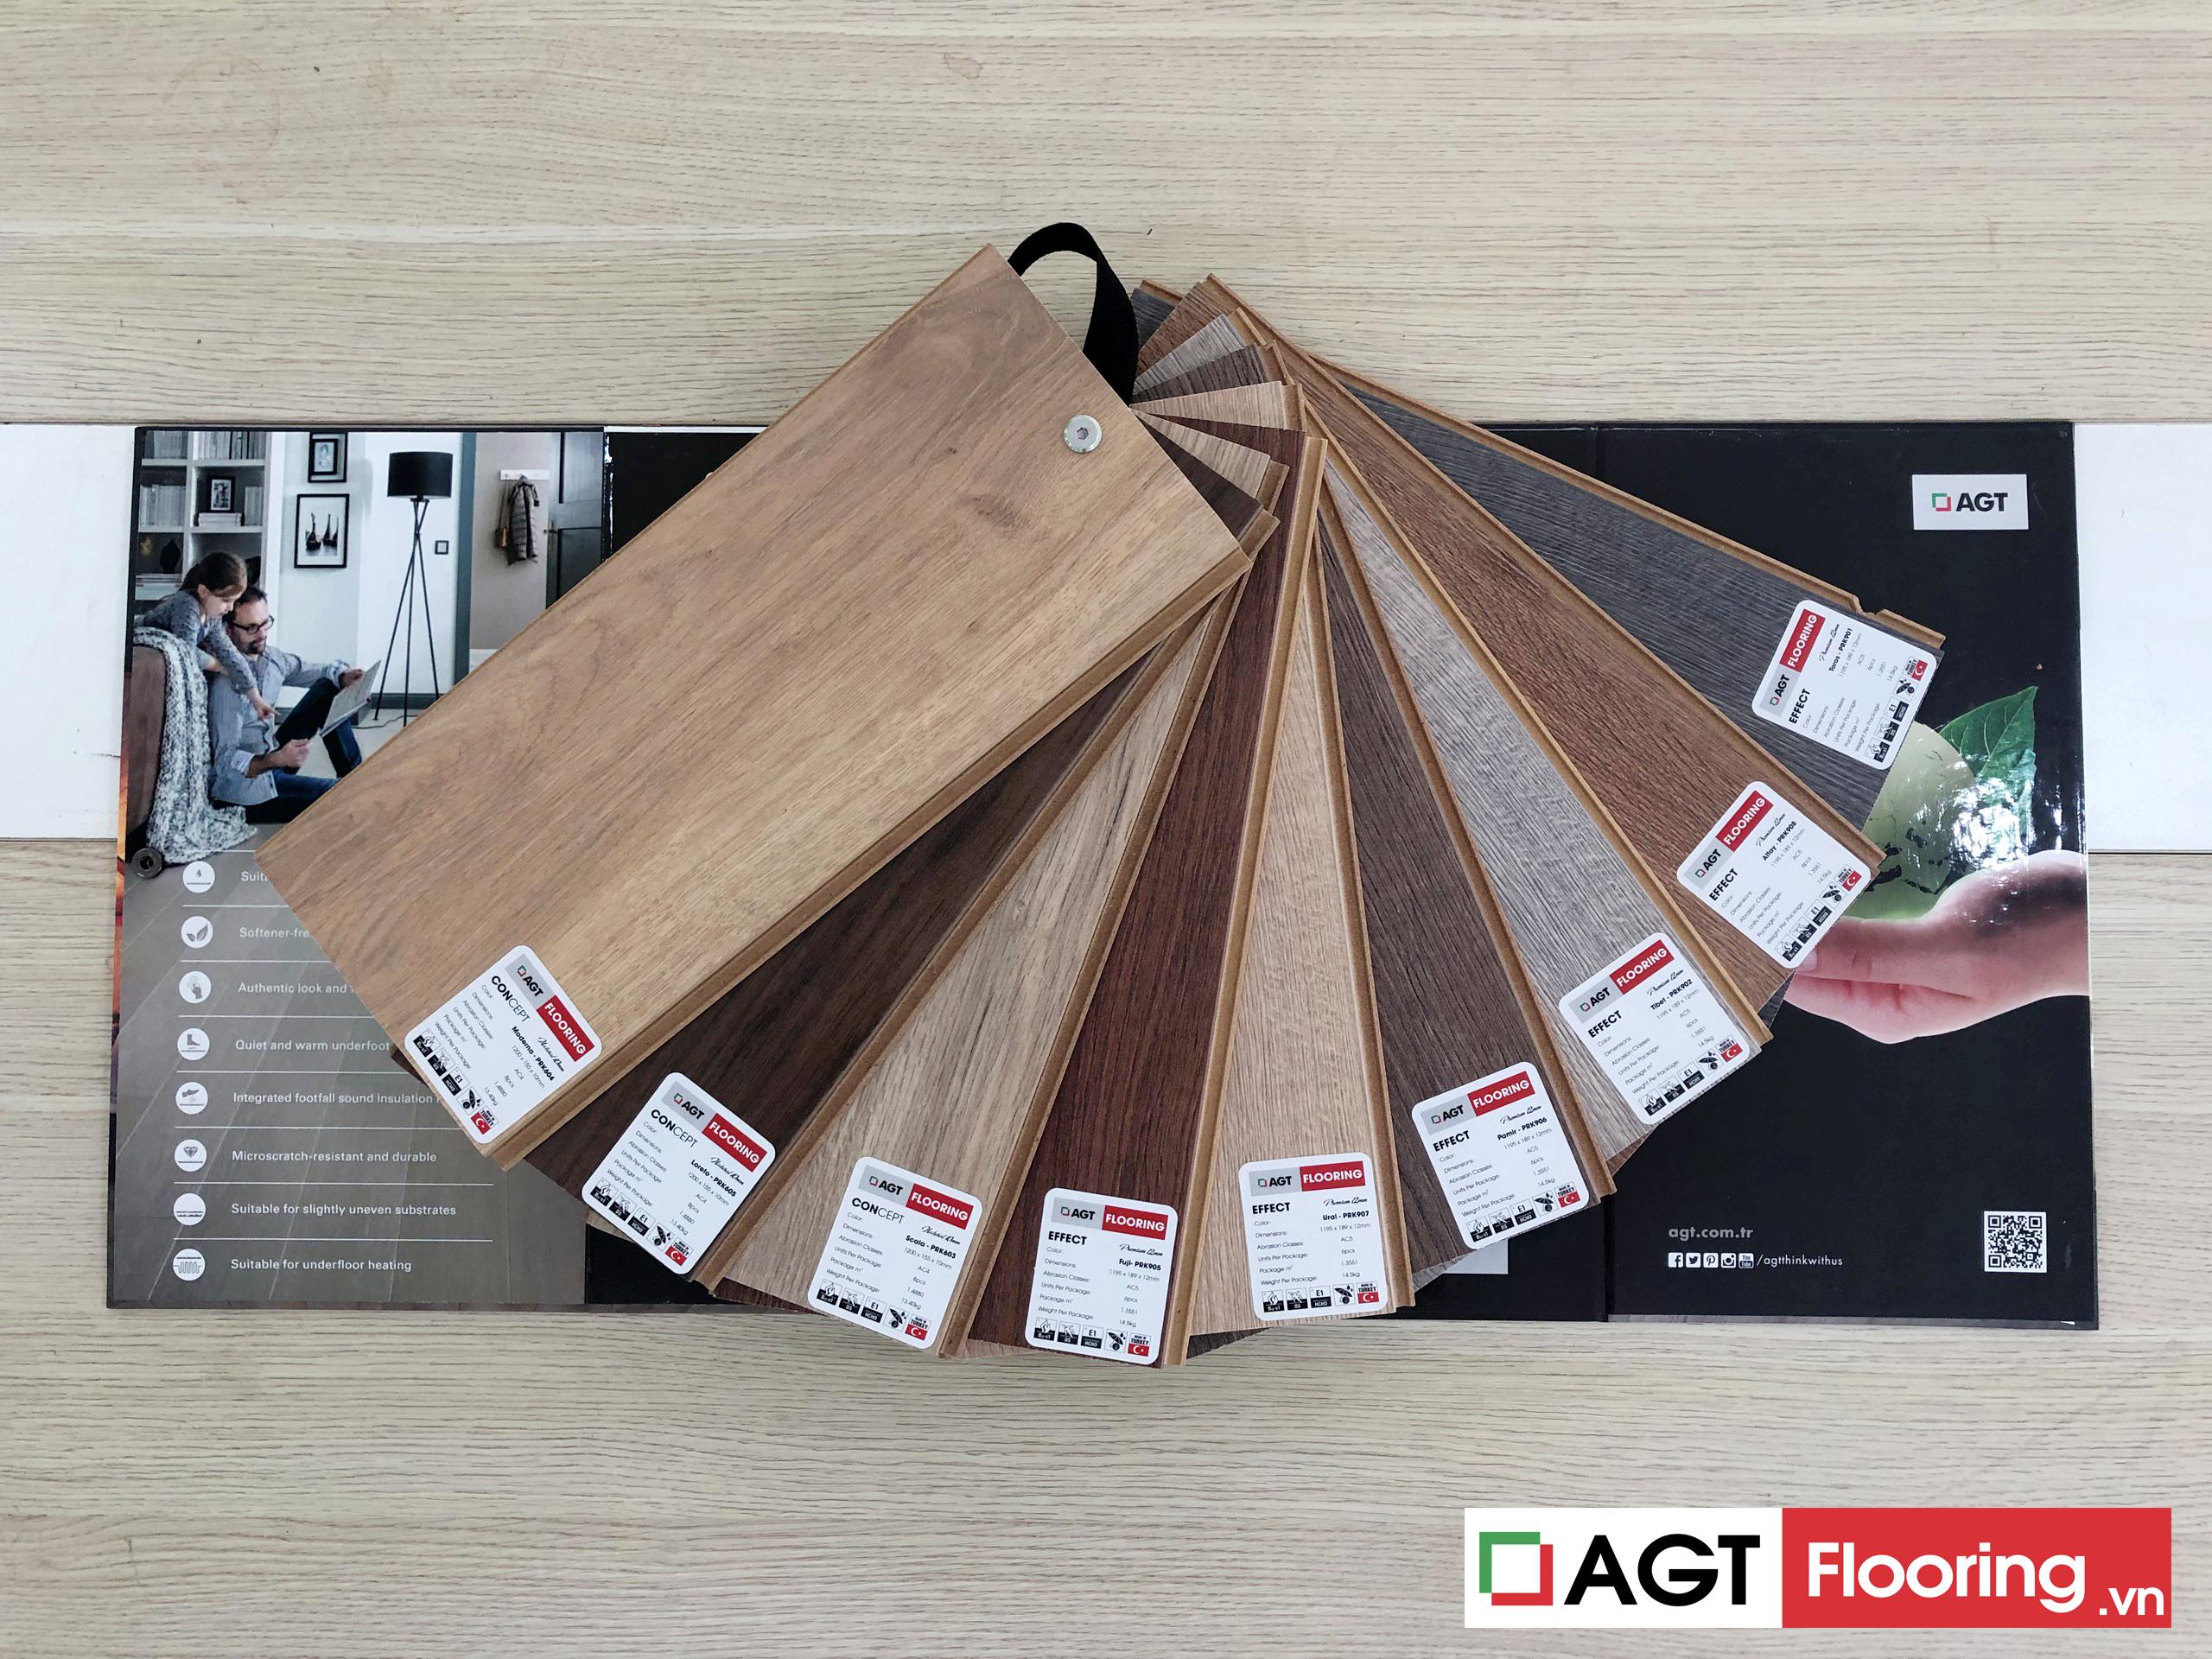 mẫu sàn gỗ AGT Flooring made in turkey